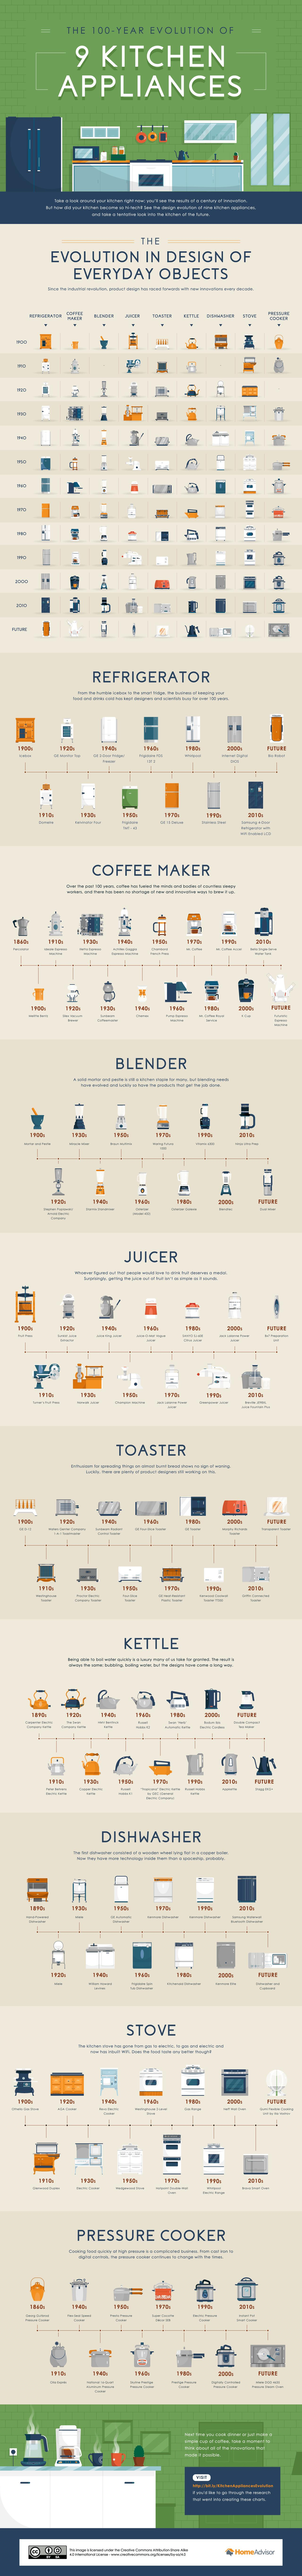 The 100-year evolution of 9 kitchen appliances